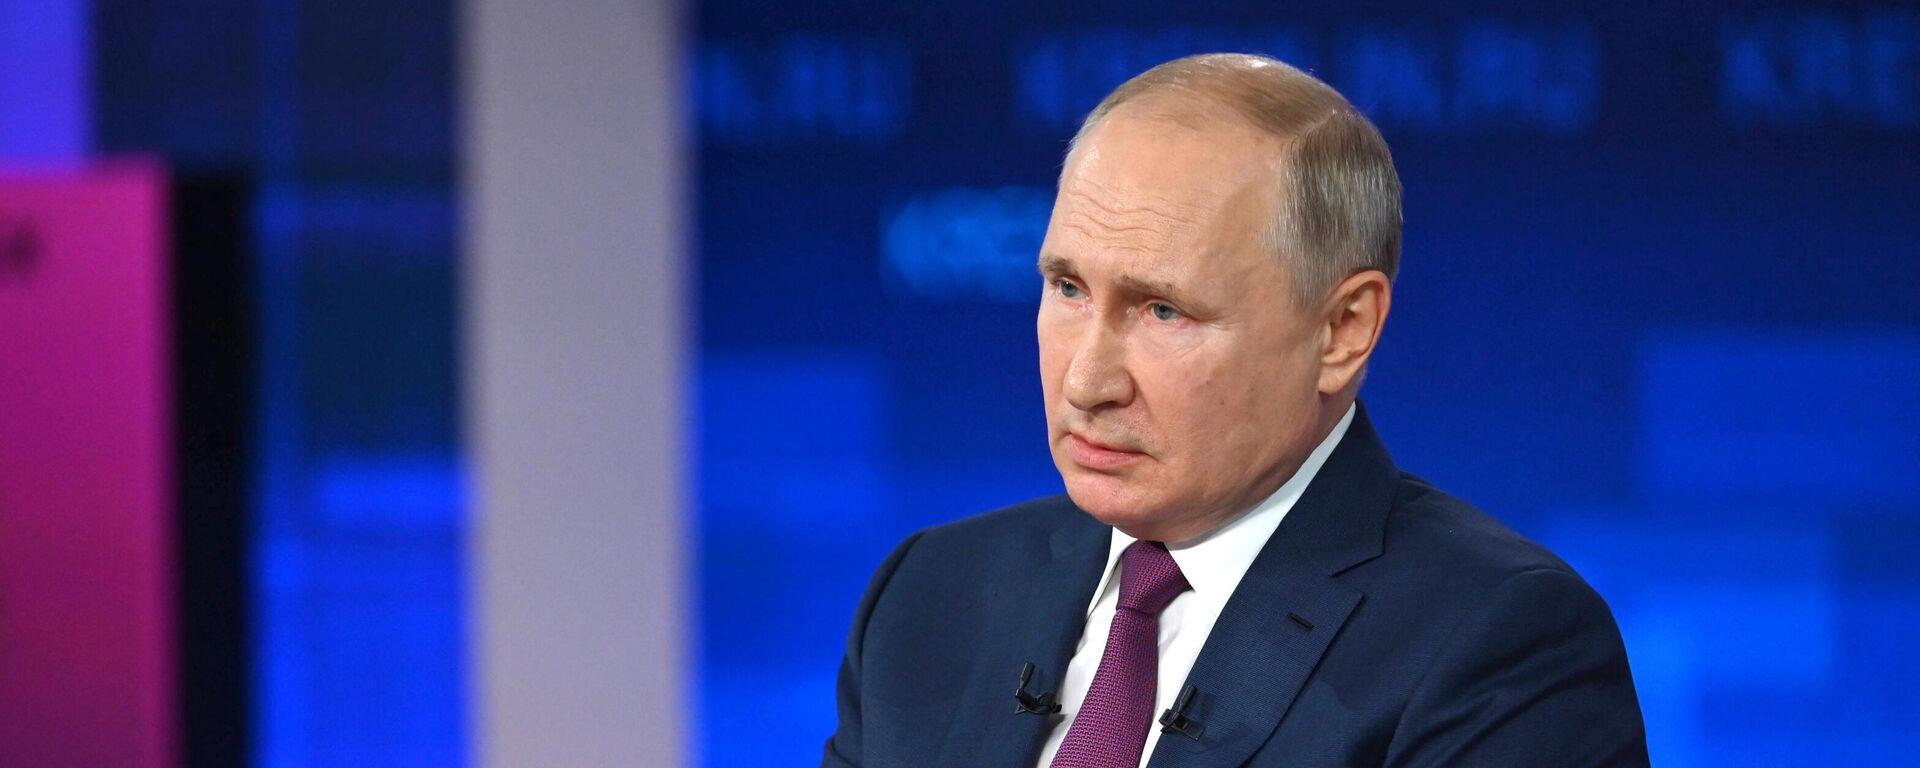 Президент РФ Владимир Путин  - Sputnik Тоҷикистон, 1920, 20.08.2021